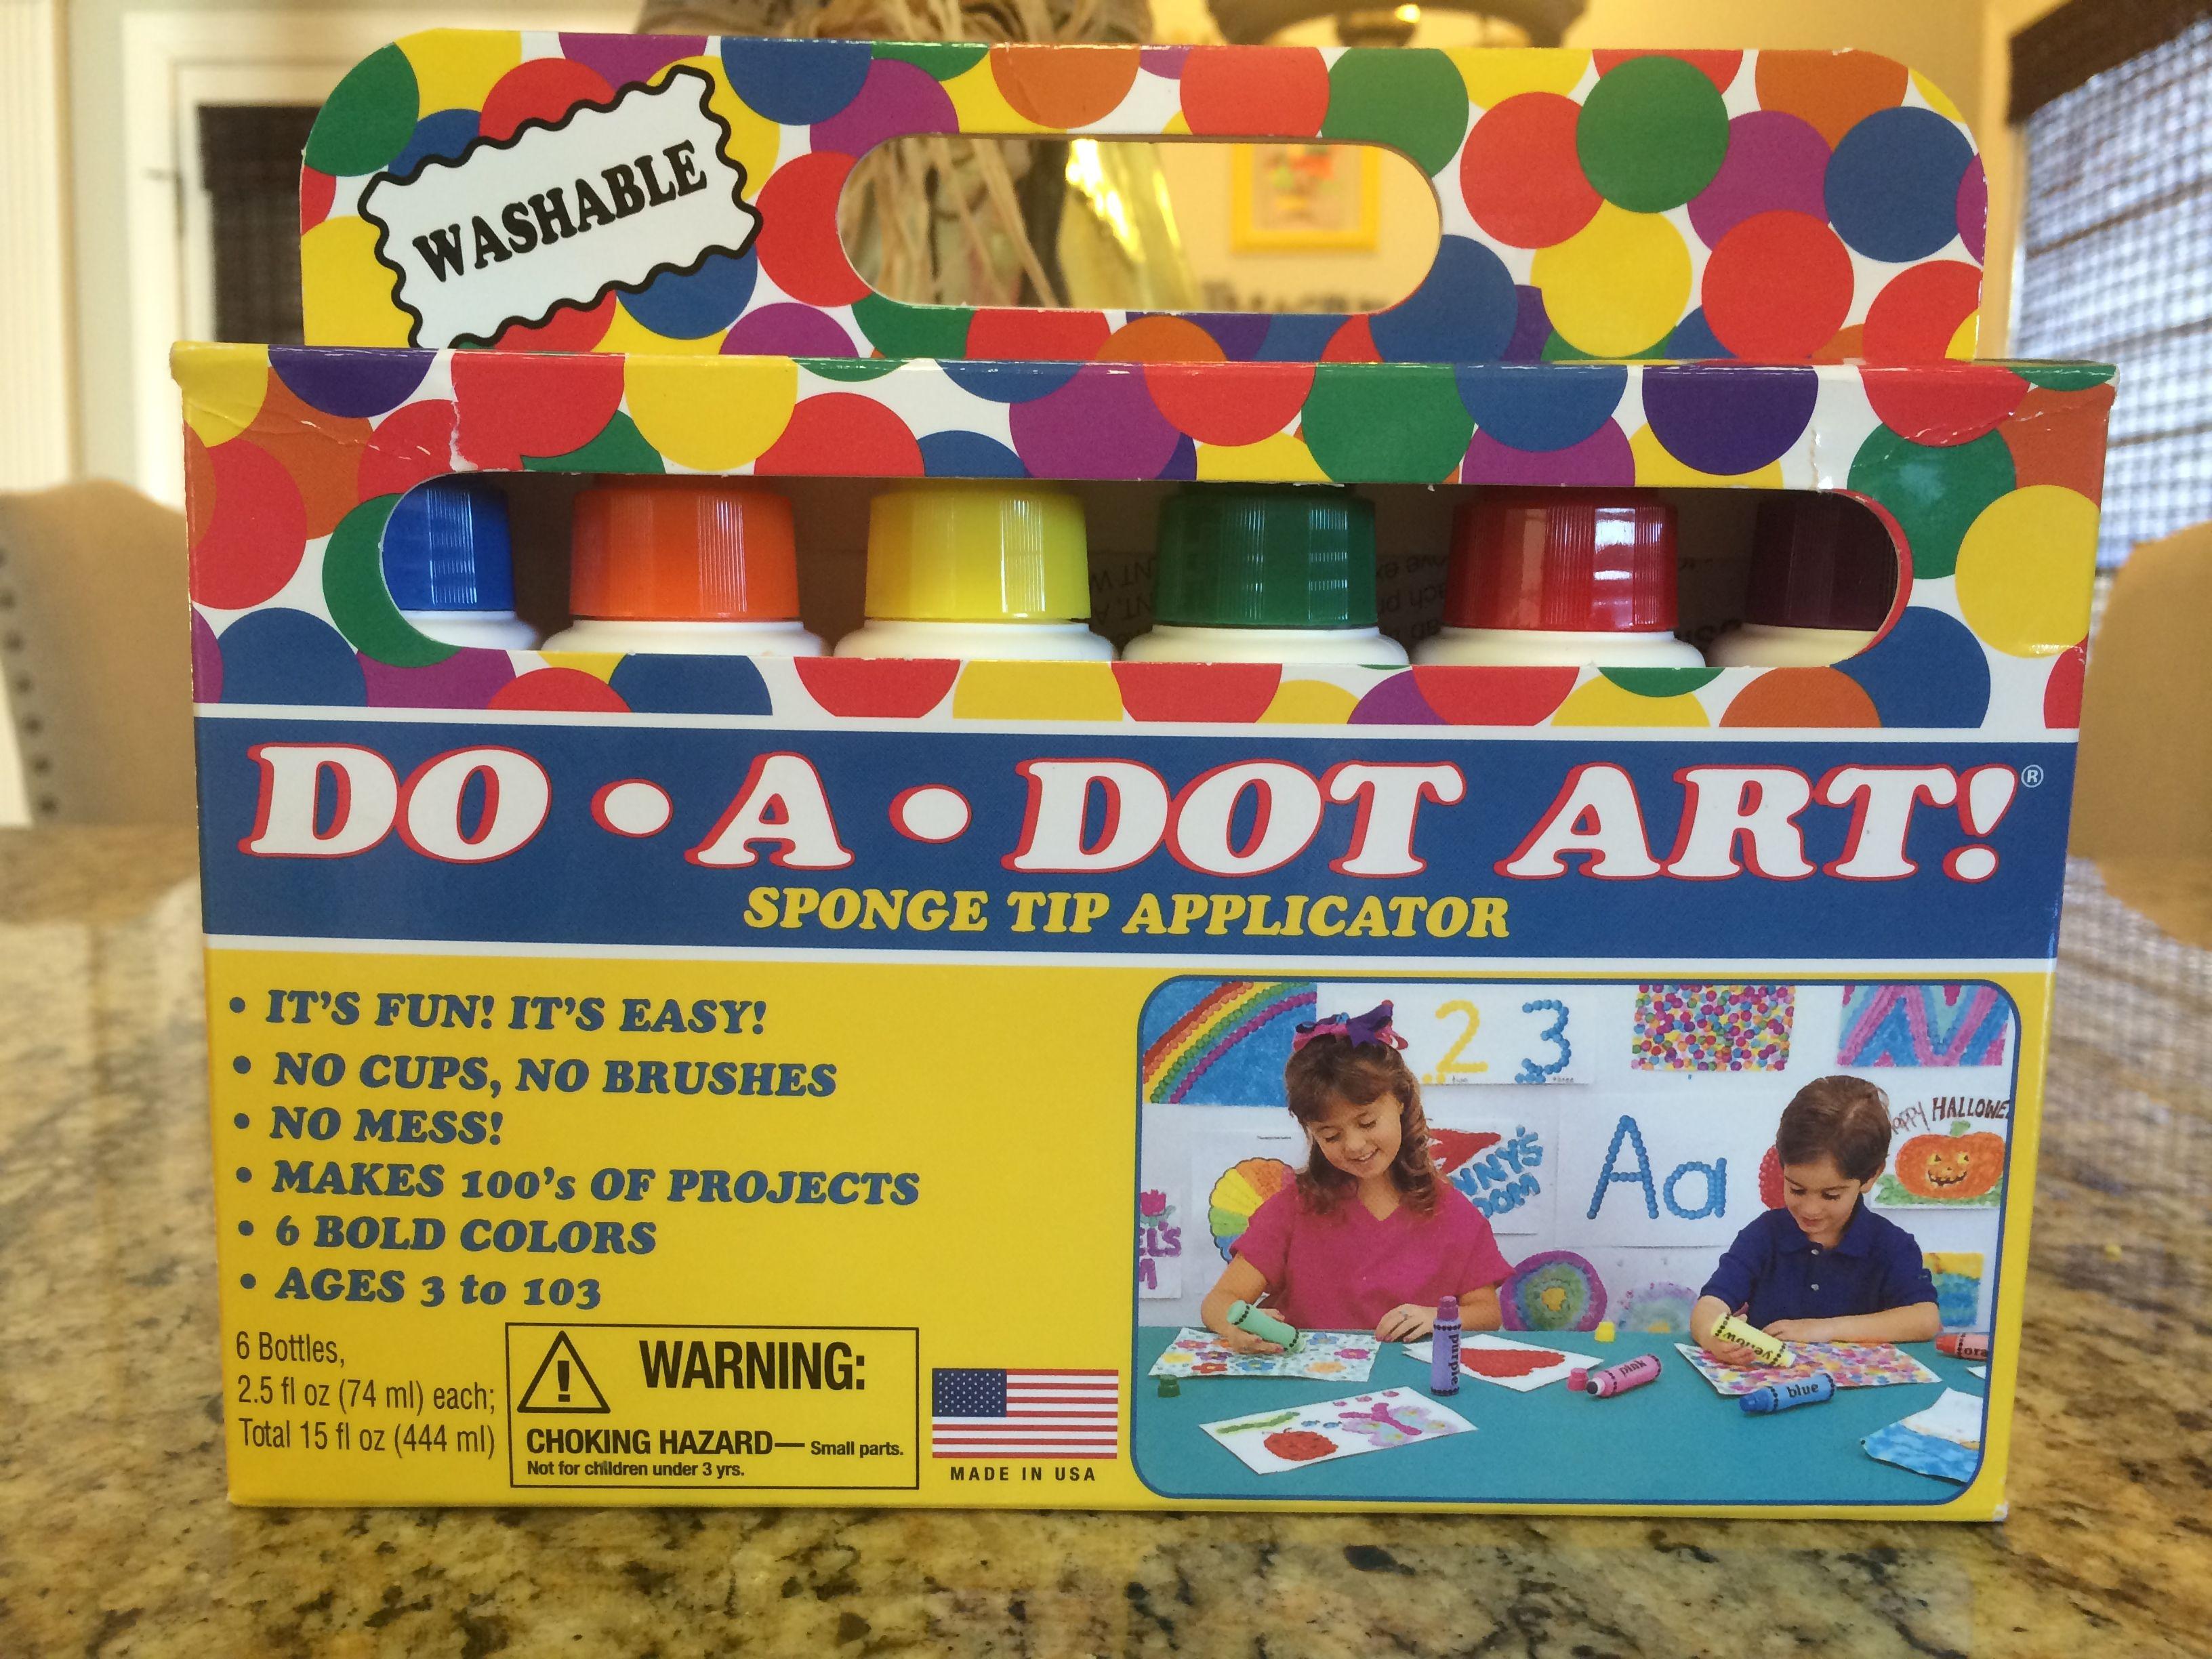 Website for free dot art printables is: http://www.dltk-kids.com ...